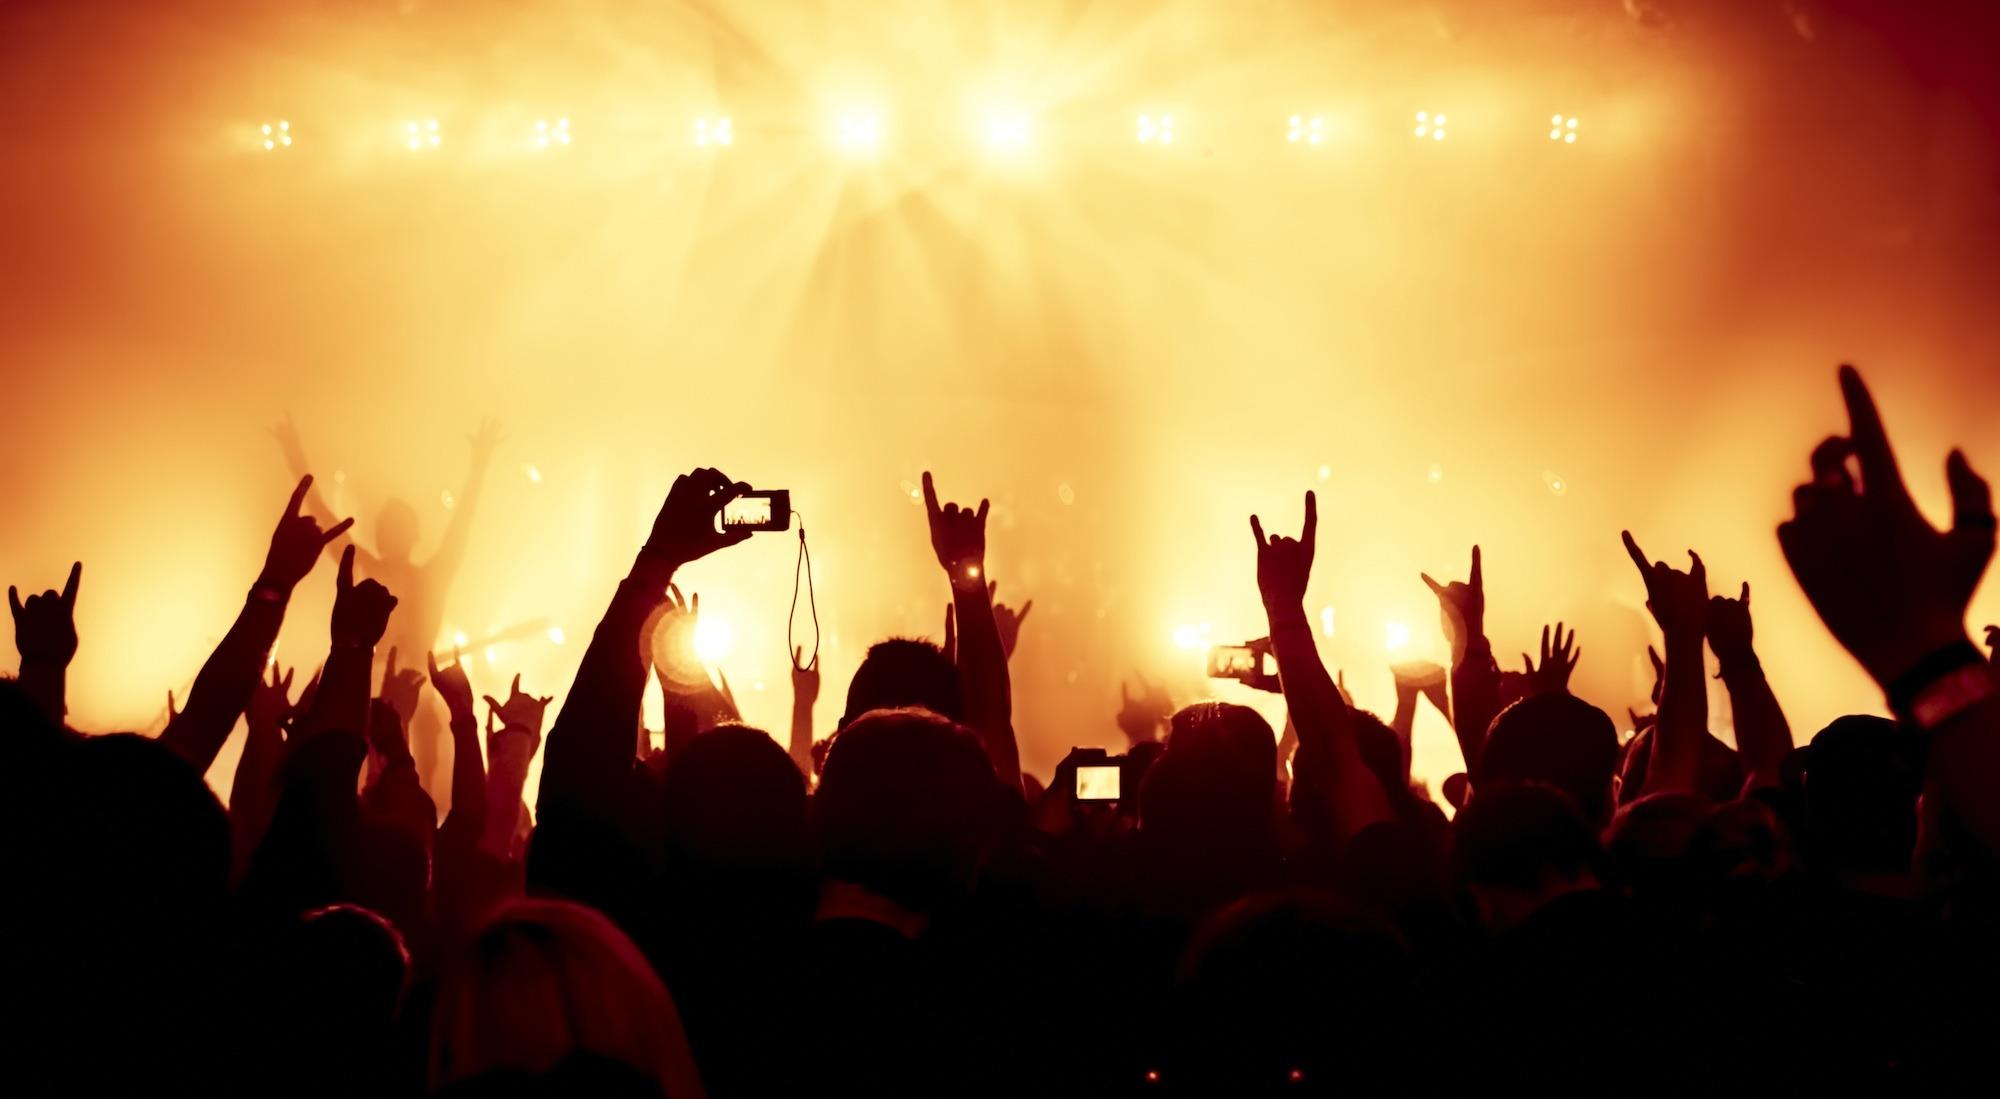 http://shbabbek.com/upload/خروجات.. حفلات موسيقية وثقافية و«قعدة ألعاب» النهارده